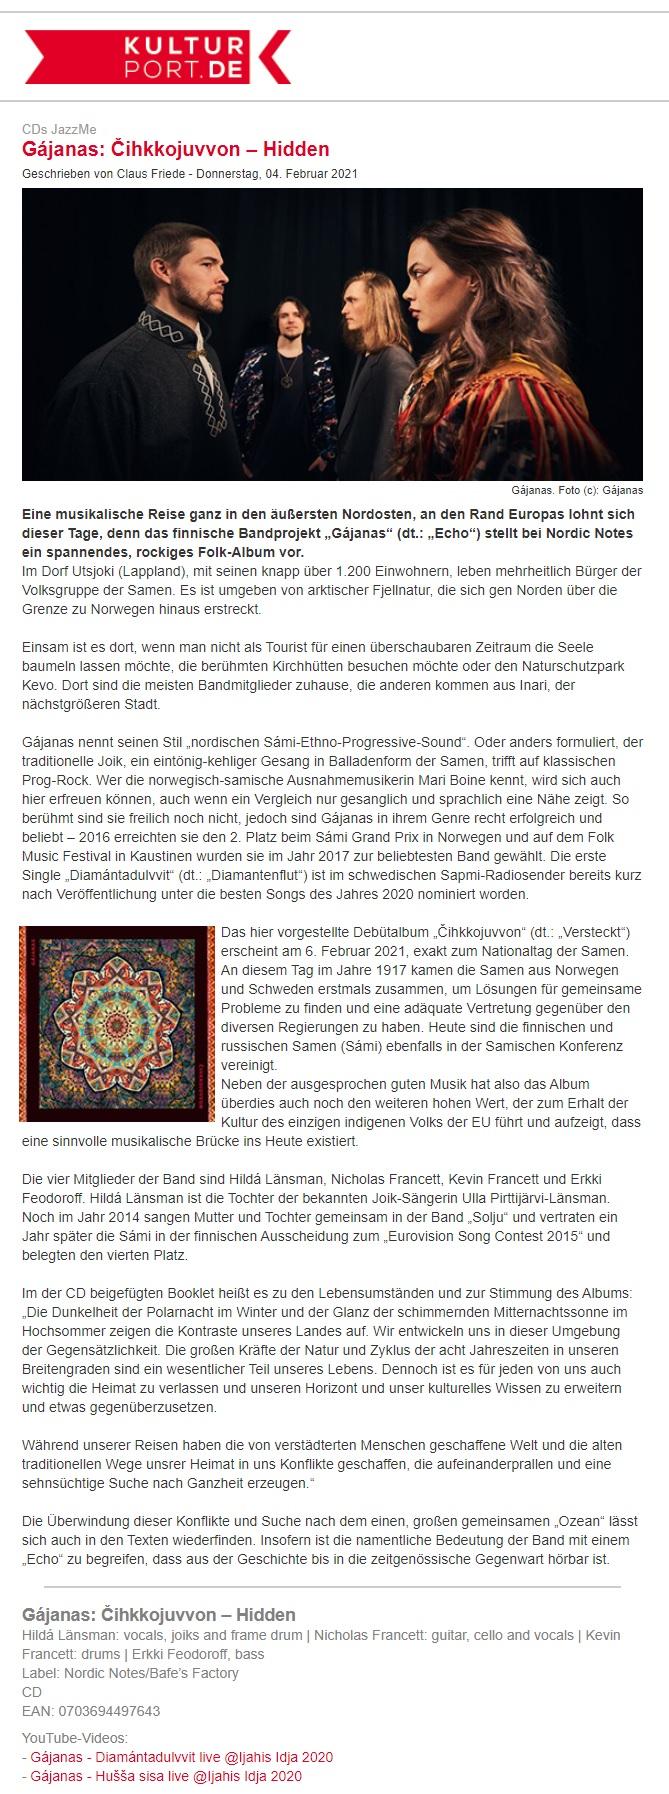 KulturPort.De (Germany), 4.2.2021